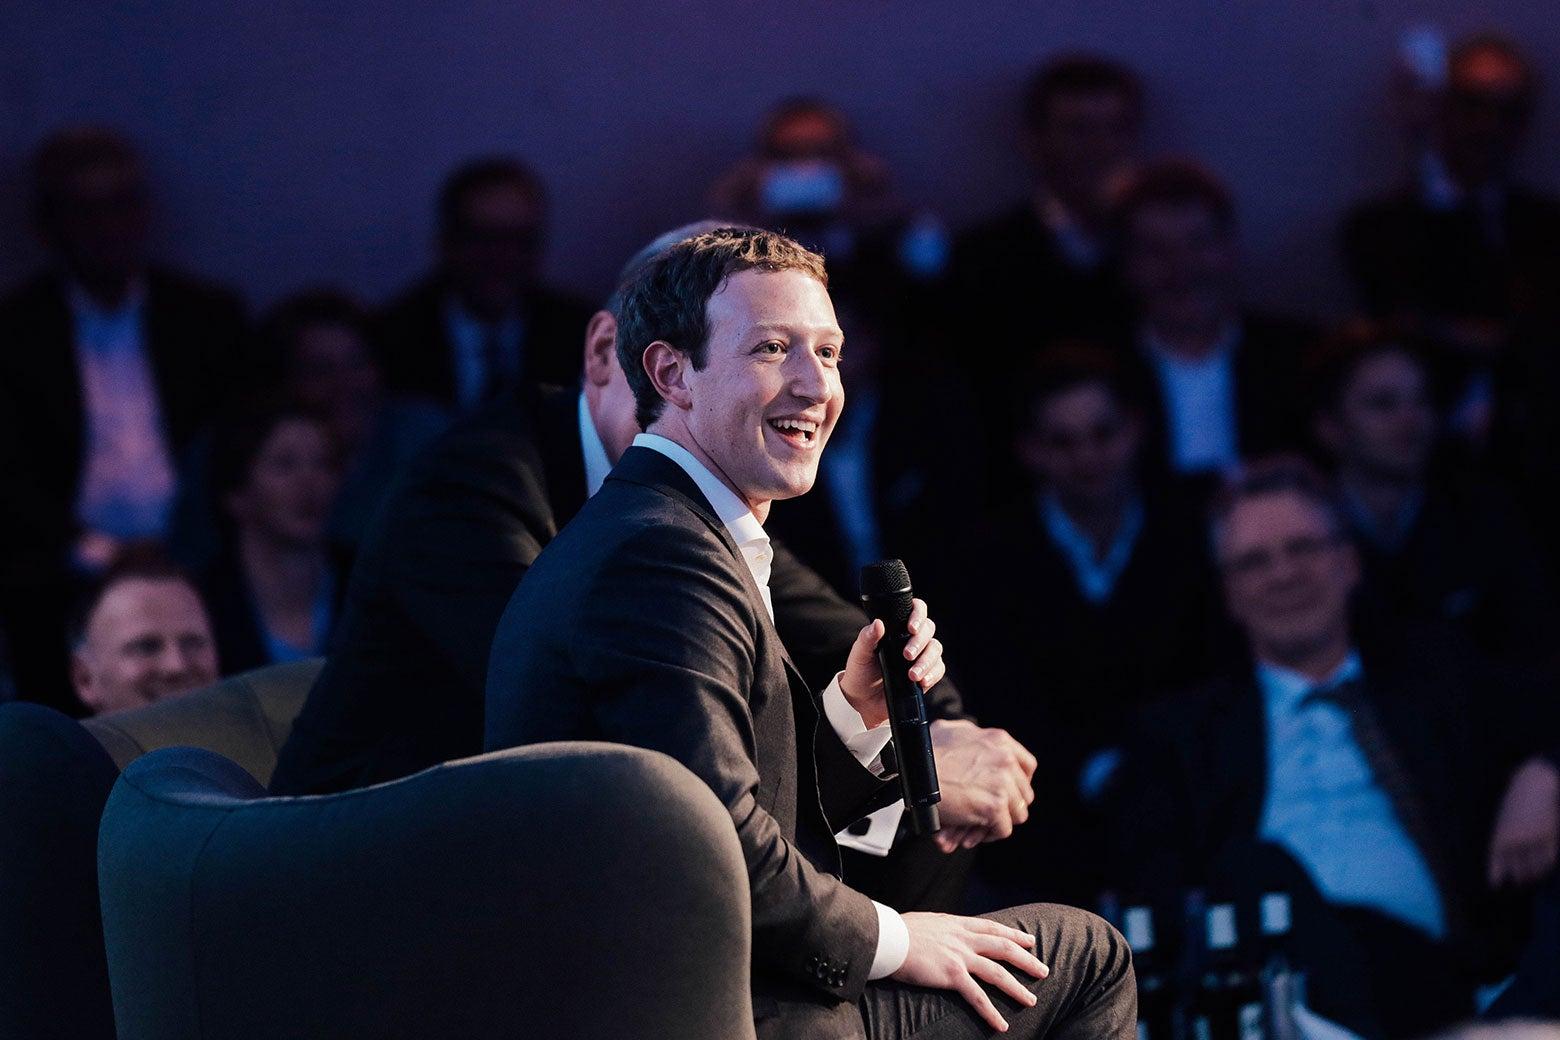 Mark Zuckerberg onstage.